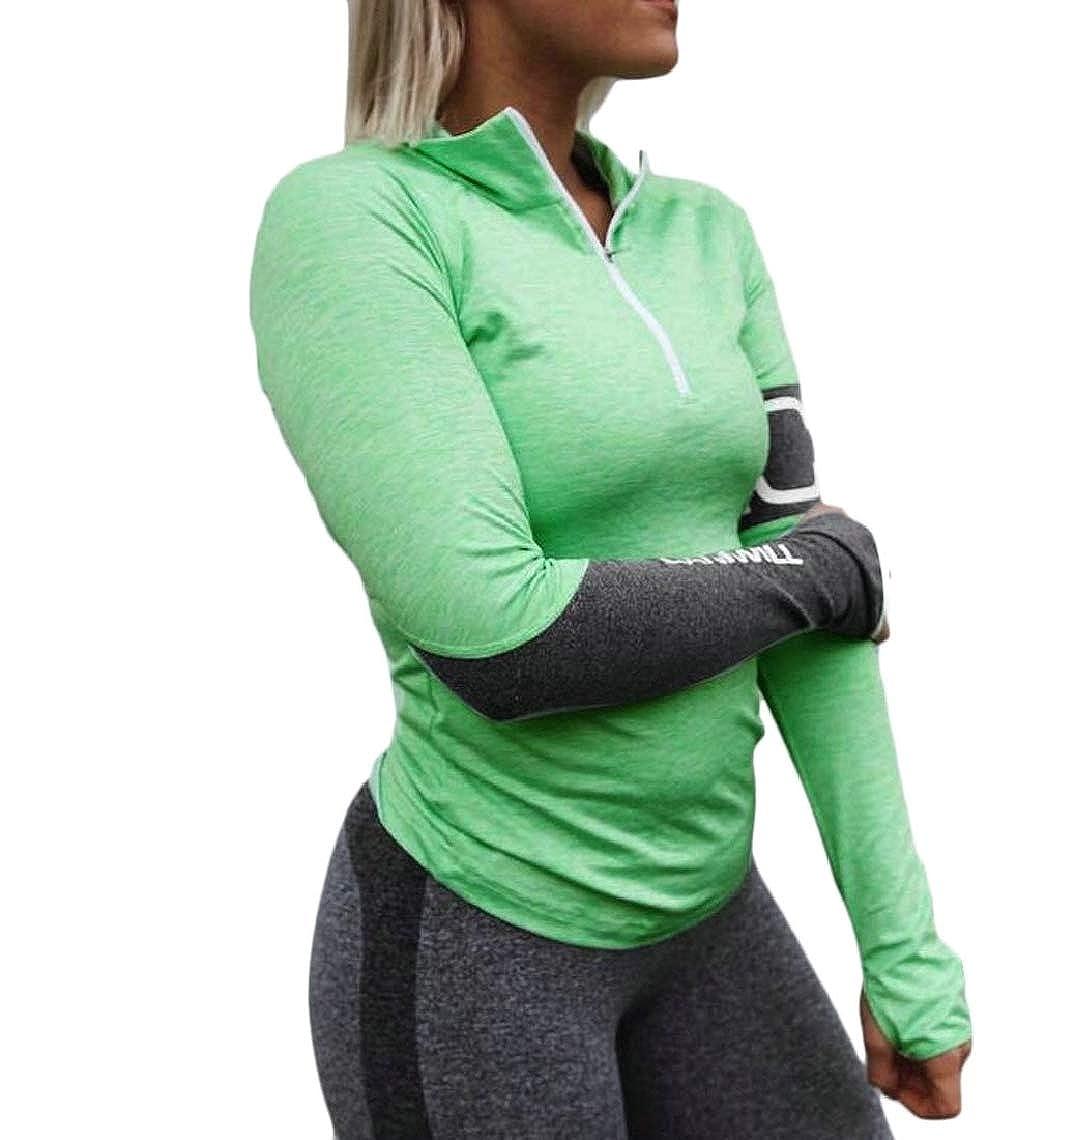 Jmwss QD Women Long Sleeve Zipper Letter Print Tops Pullover Sweatshirts